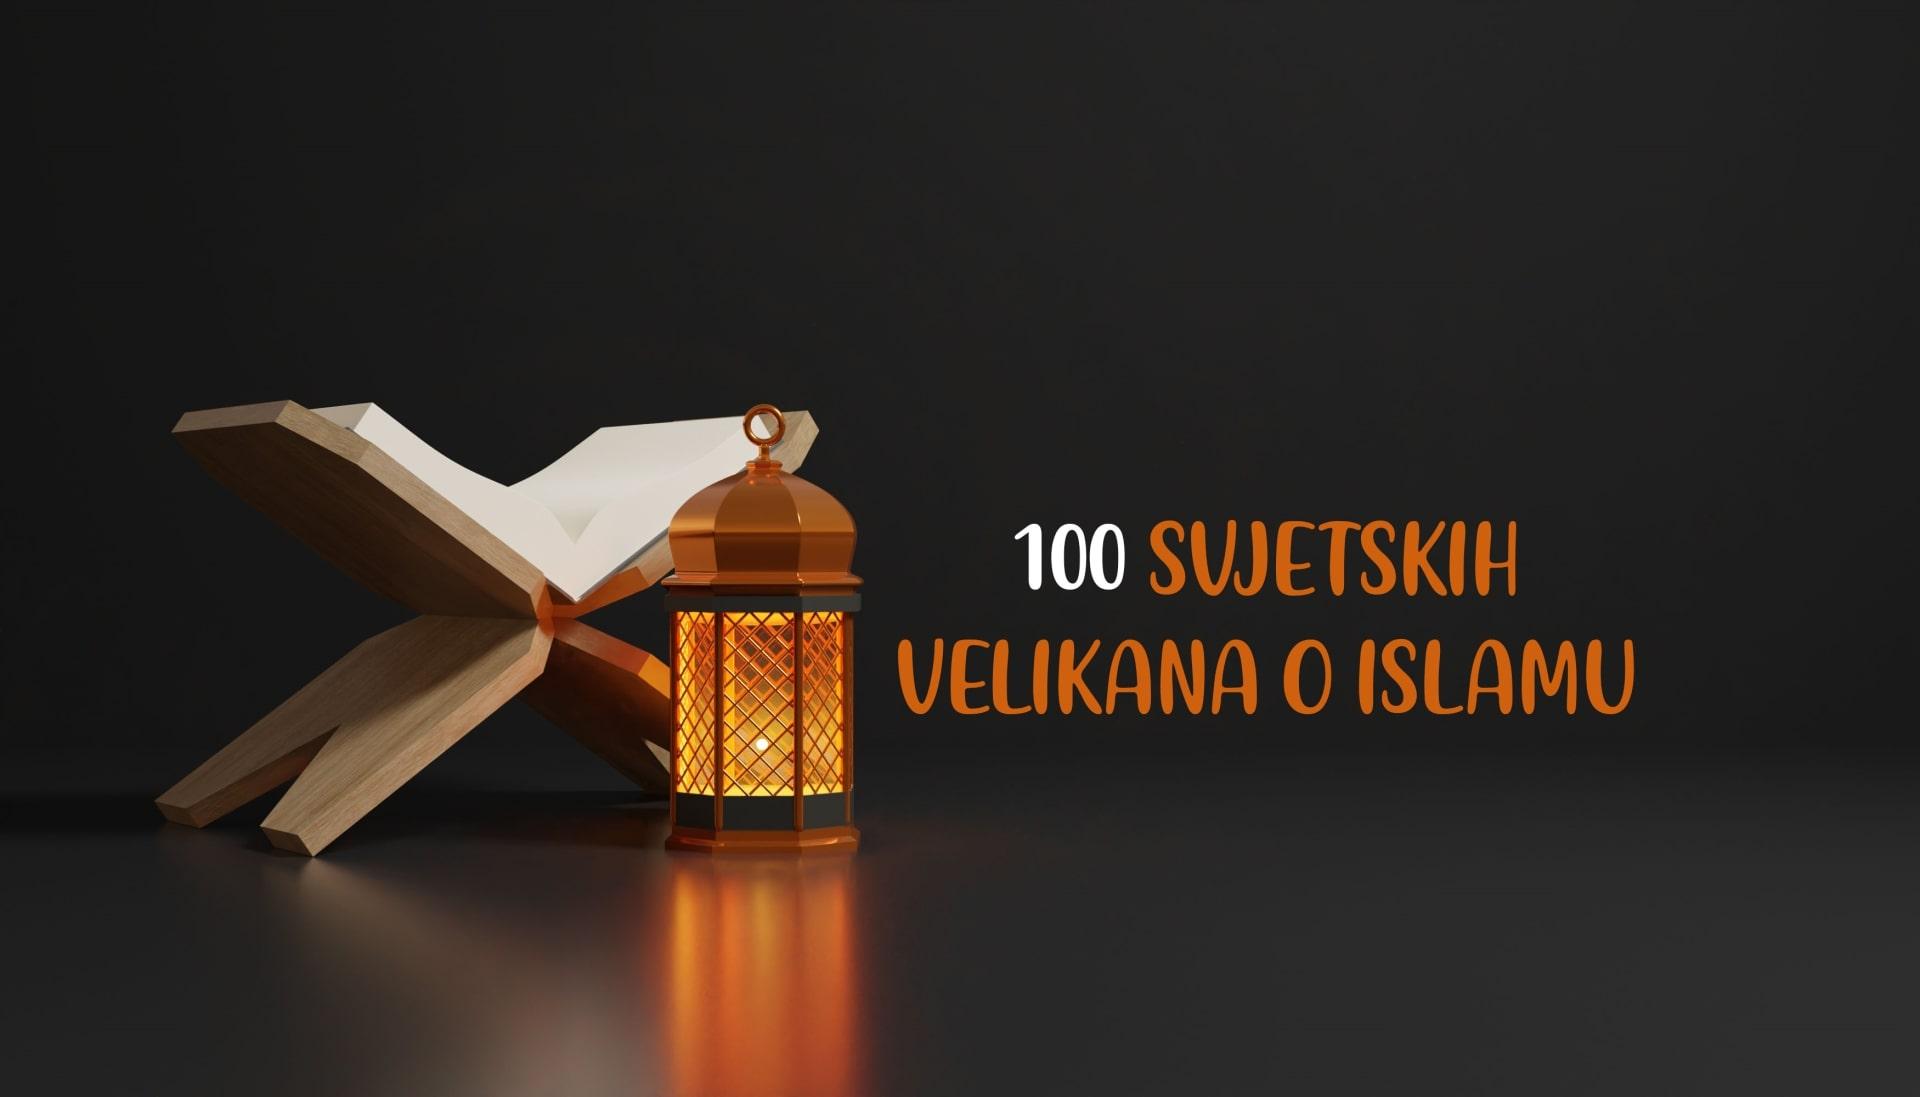 100 svjetskih velikana o islamu – Džordž Sarton Poučne priče El-Kelimeh Islamska literatura Islamske knjige